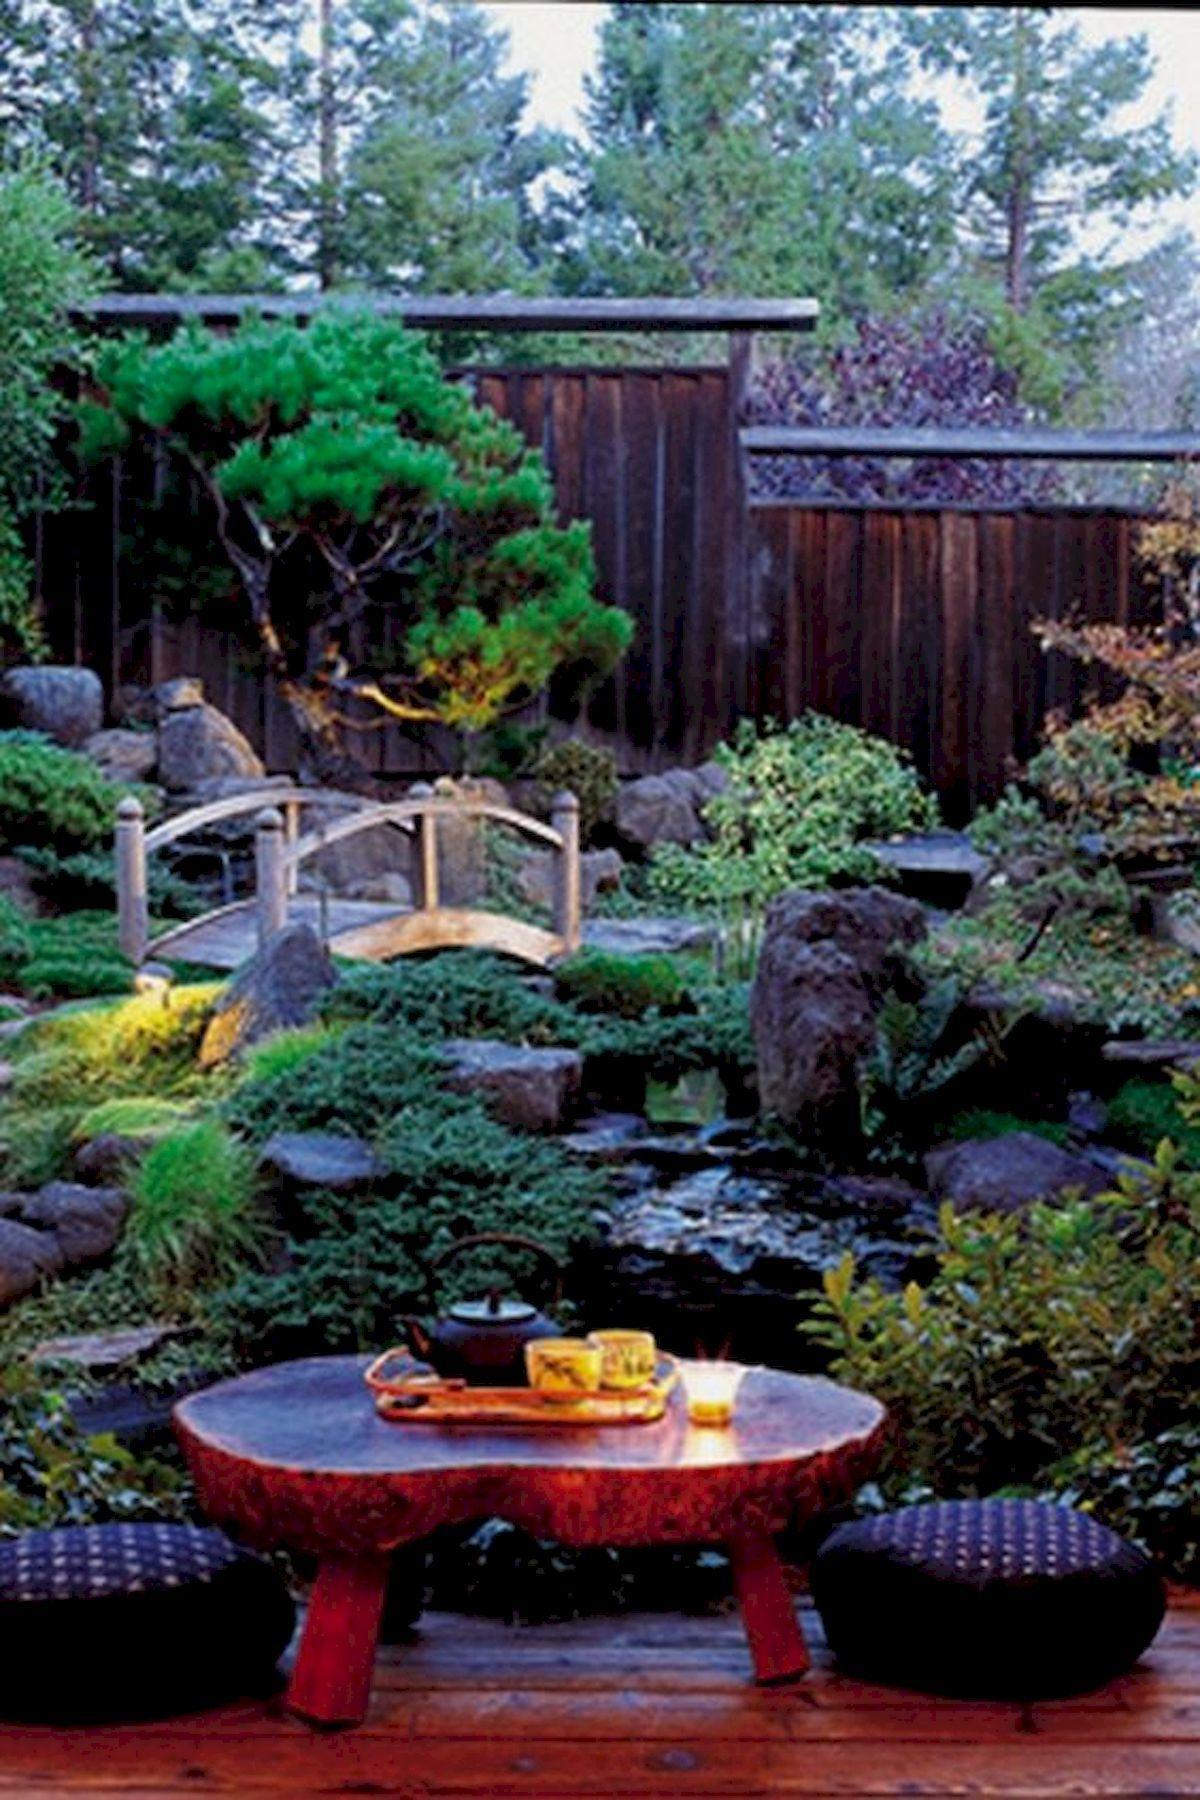 Awesome 80 Beautiful Side Yard And Backyard Japanese Garden Design Ideas Source Japanese Garden Landscape Small Japanese Garden Japanese Gardens Design Ideas Japanese garden ideas for backyard